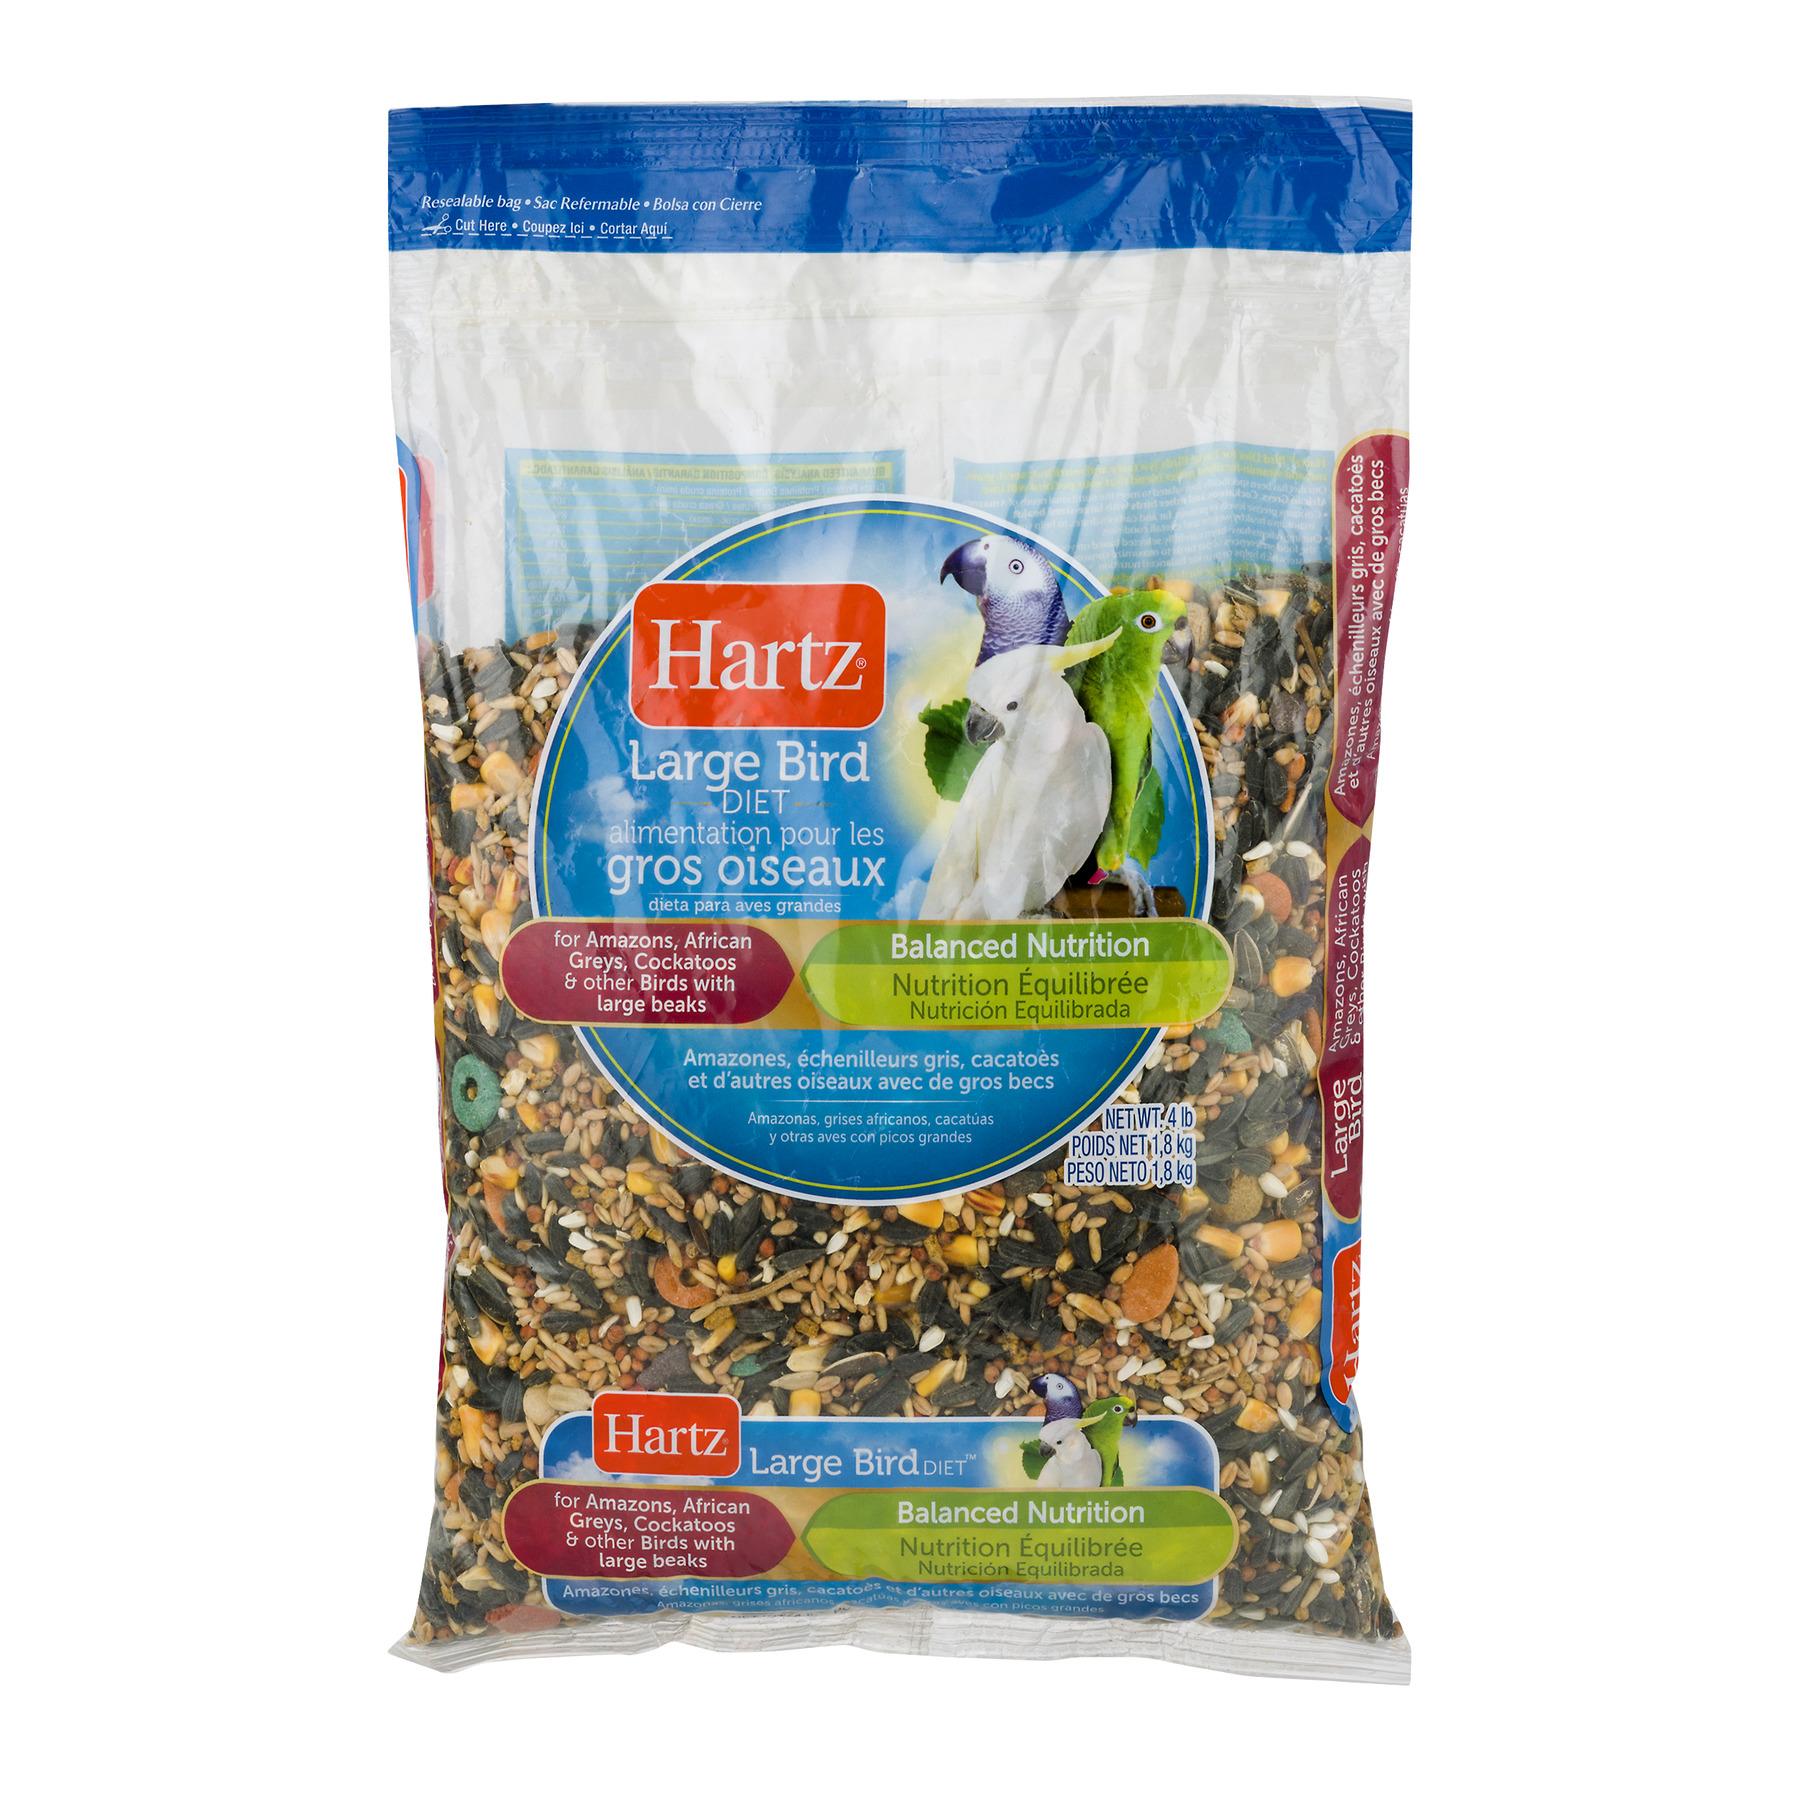 Hartz Large Bird Diet Balanced Nutrition, 4.0 LB by The Hartz Mountain Corporation